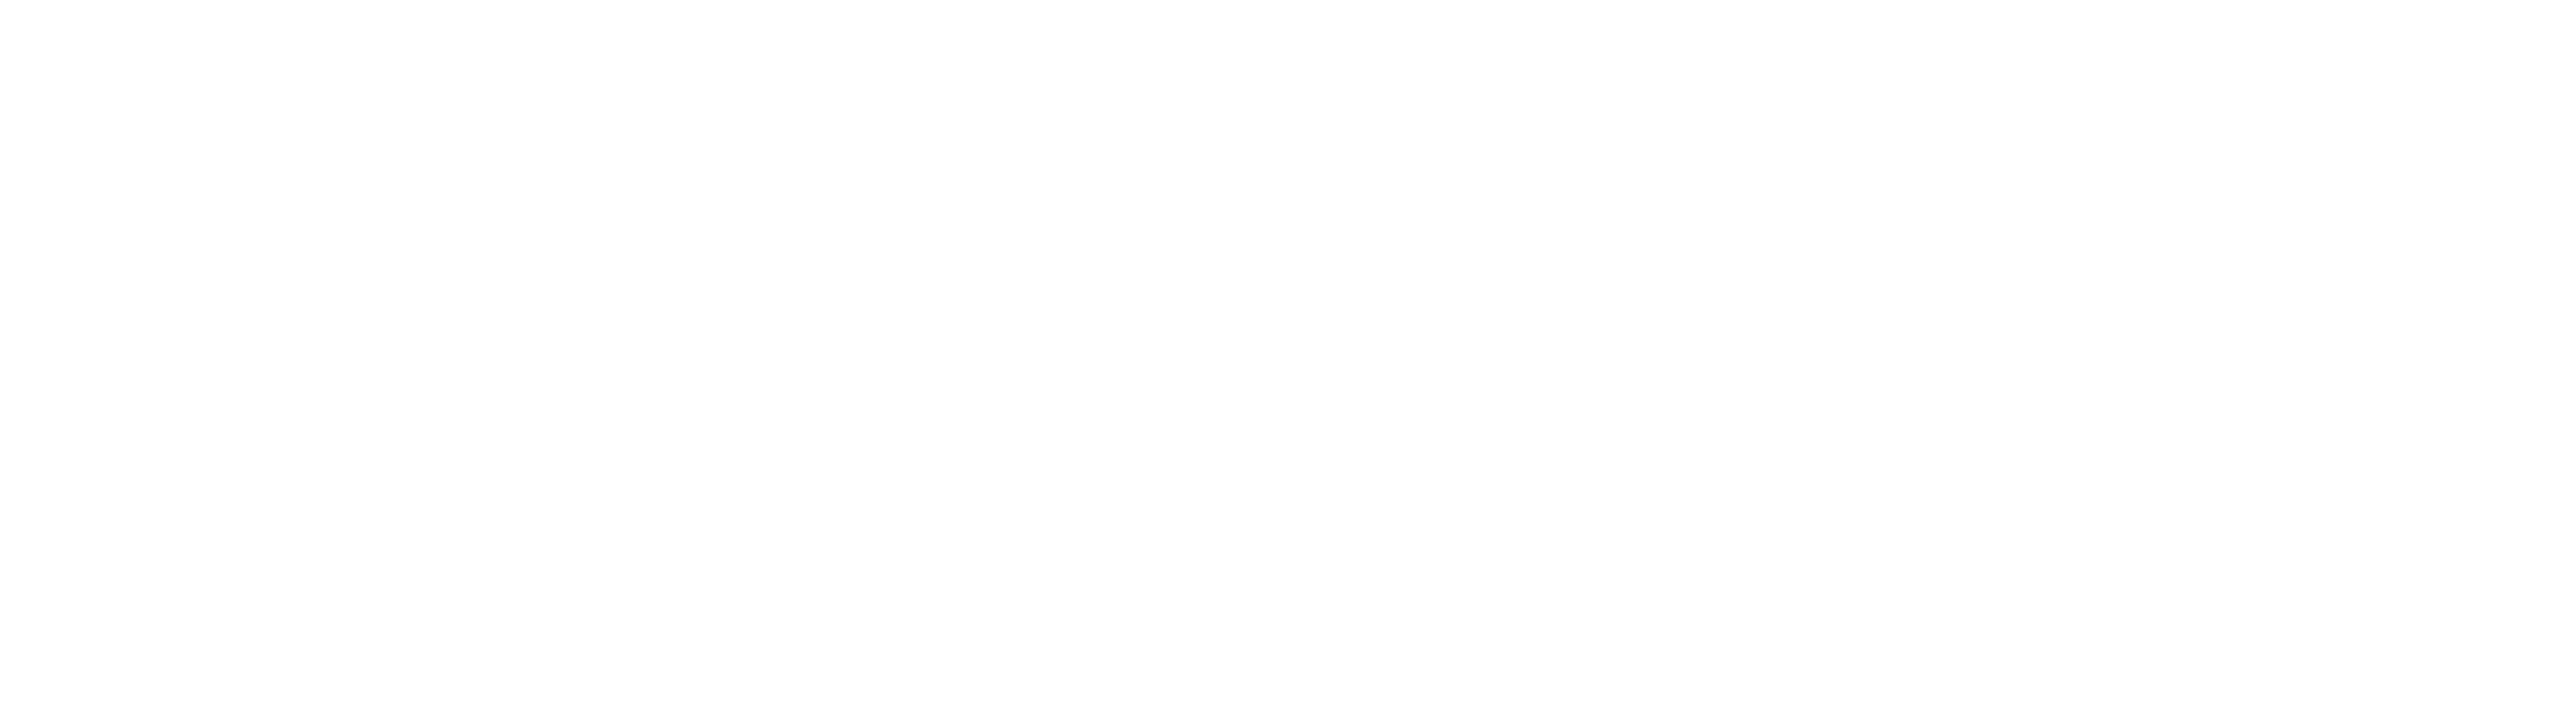 Computarte